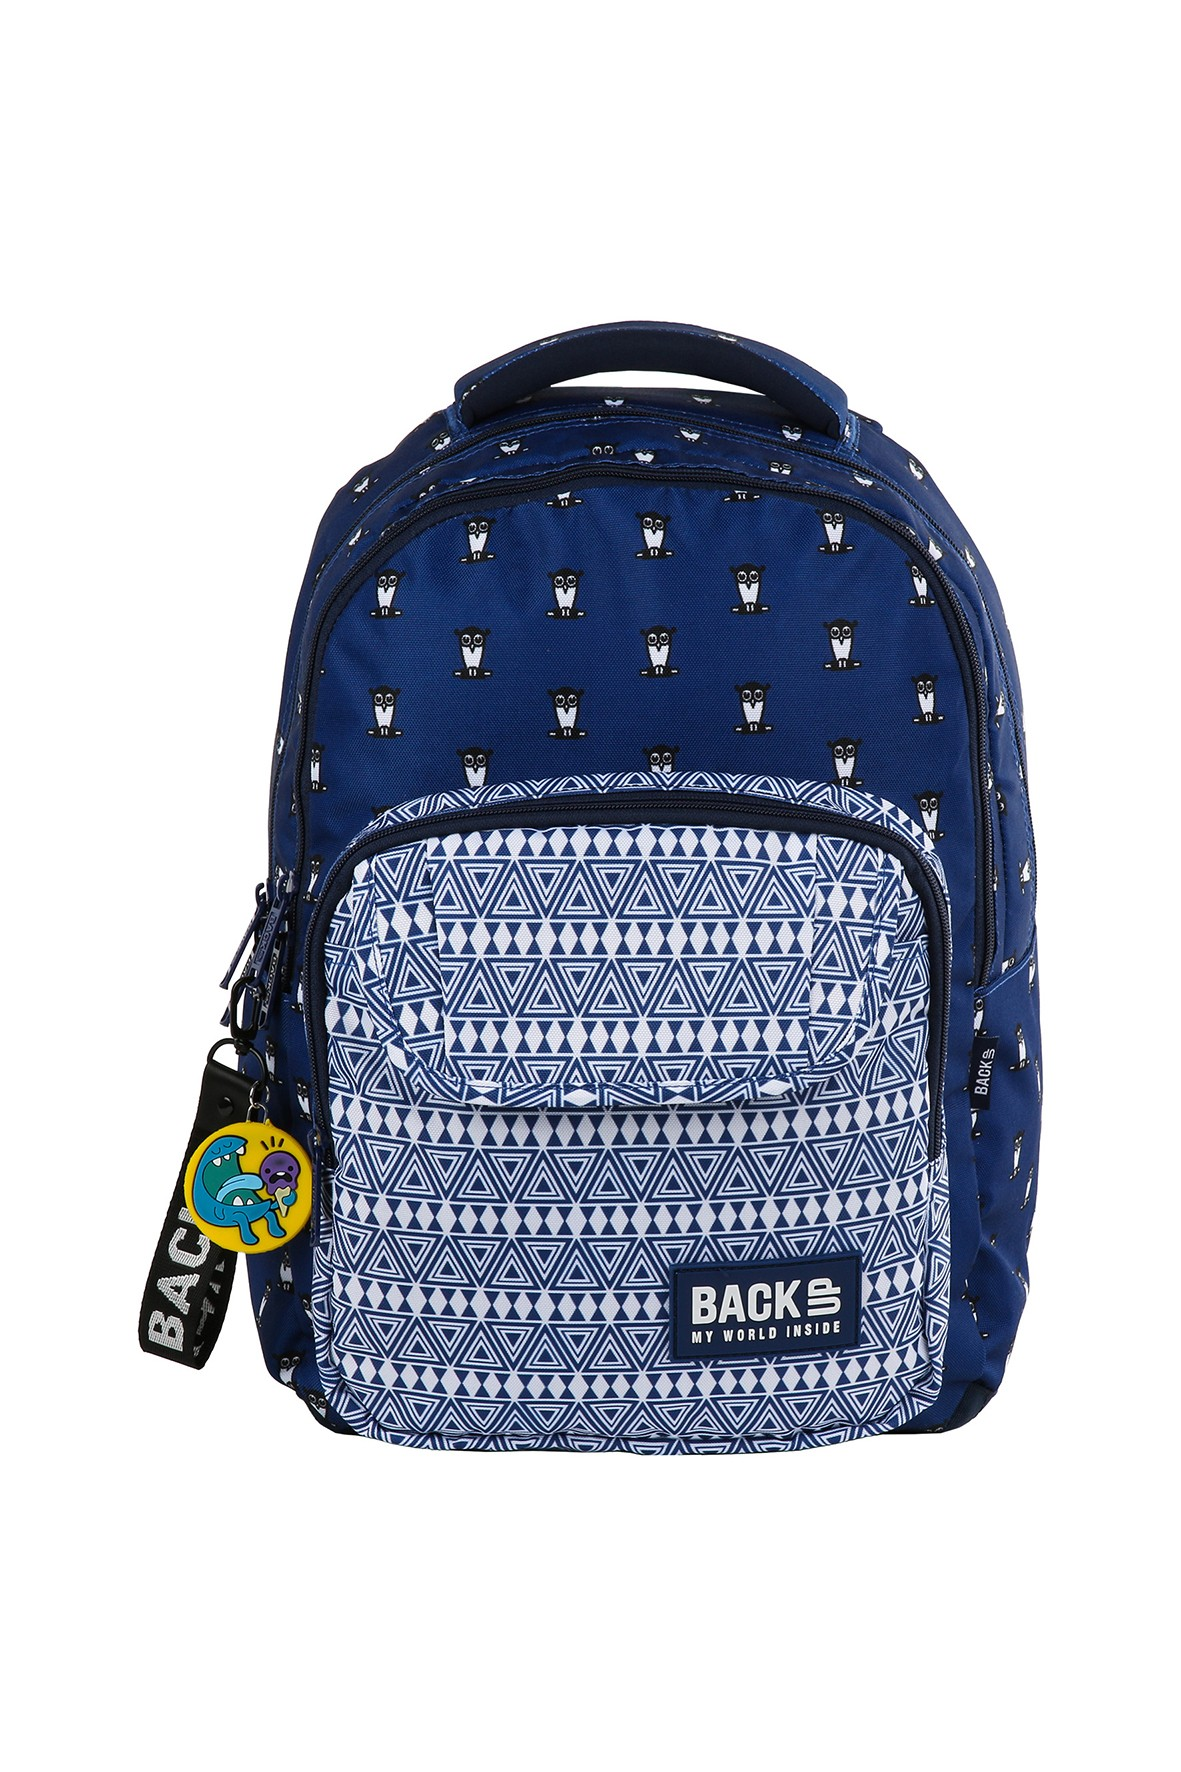 Plecak BACKUP  - niebieski